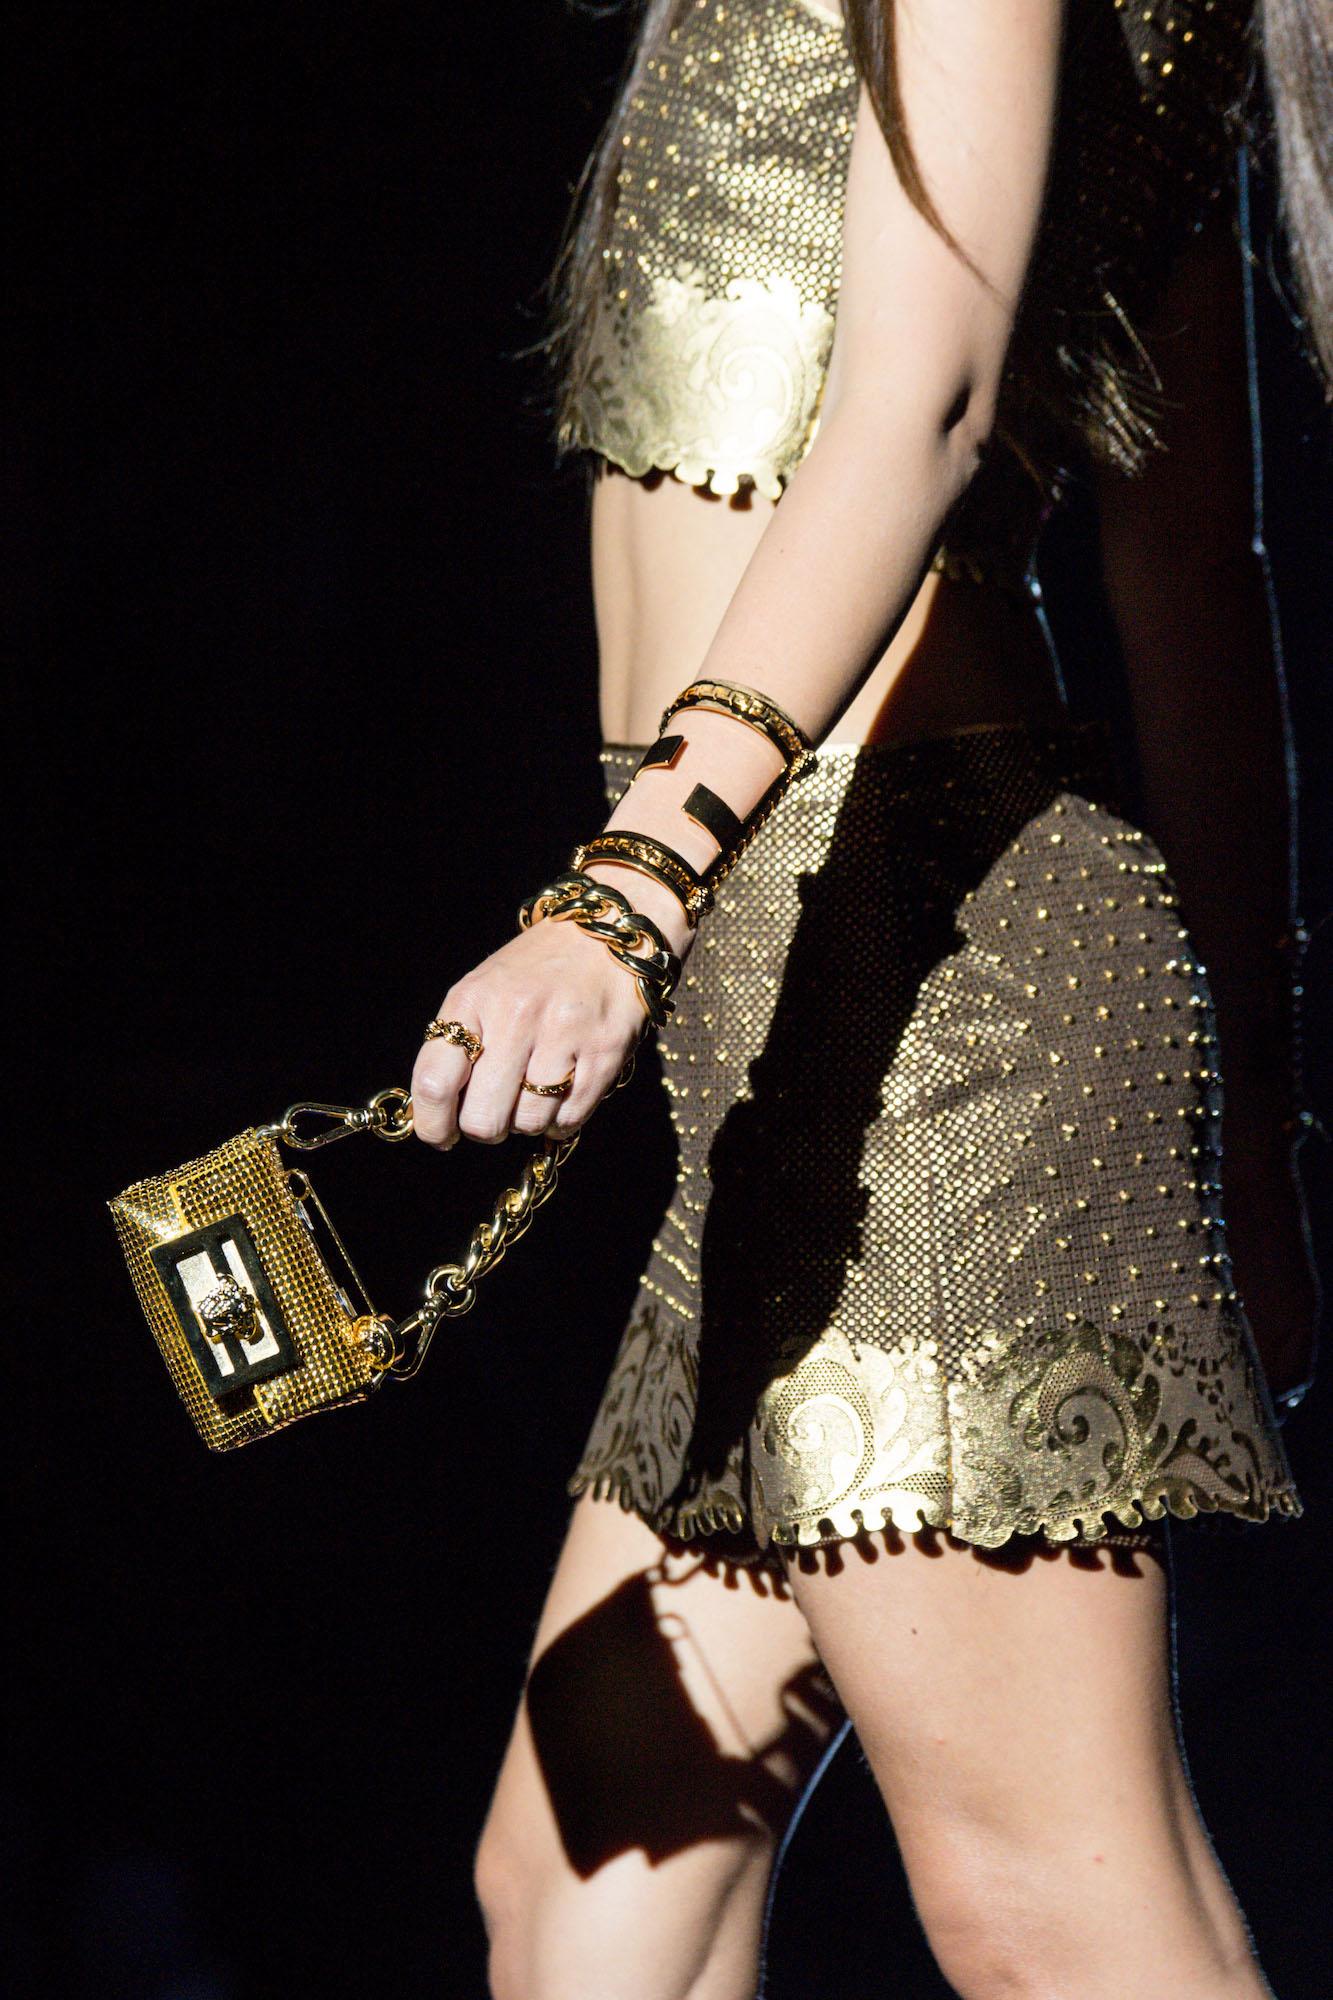 fendi by versace details (6)